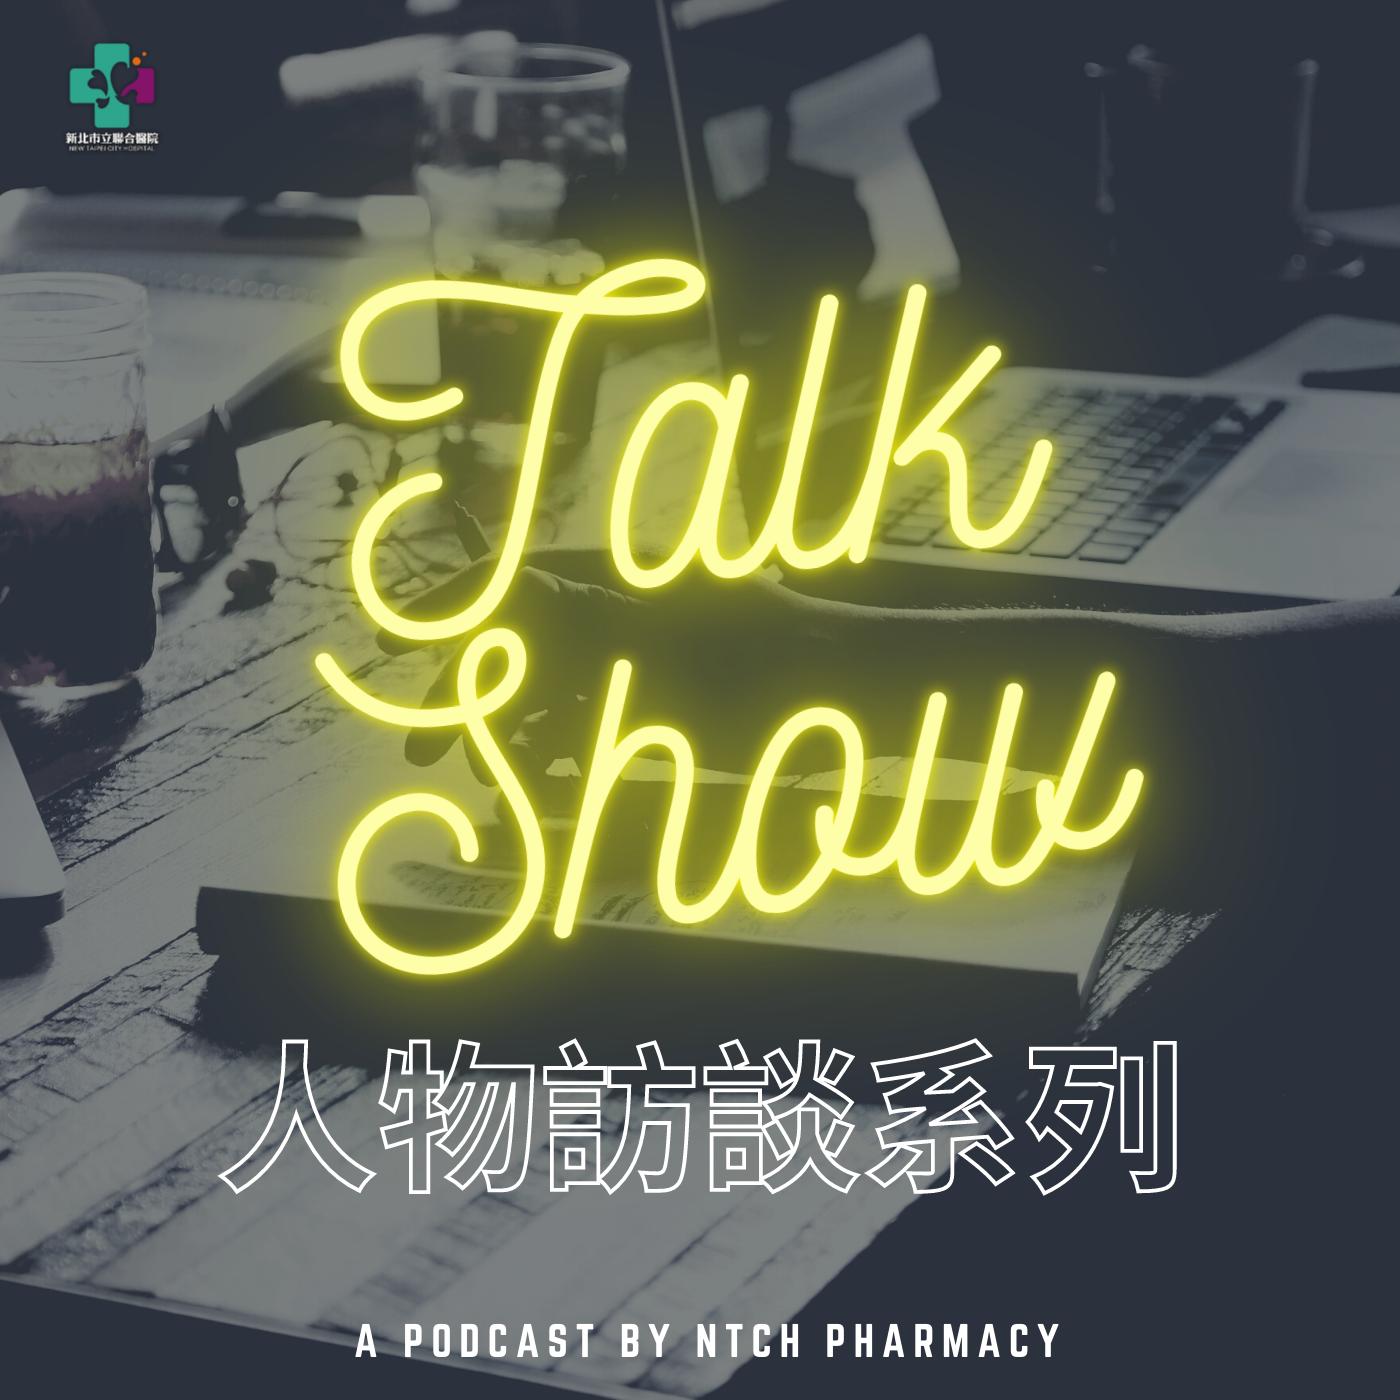 【 Talk Show 】EP.5 你是不是也很久沒好好觀賞第八藝術了呢?